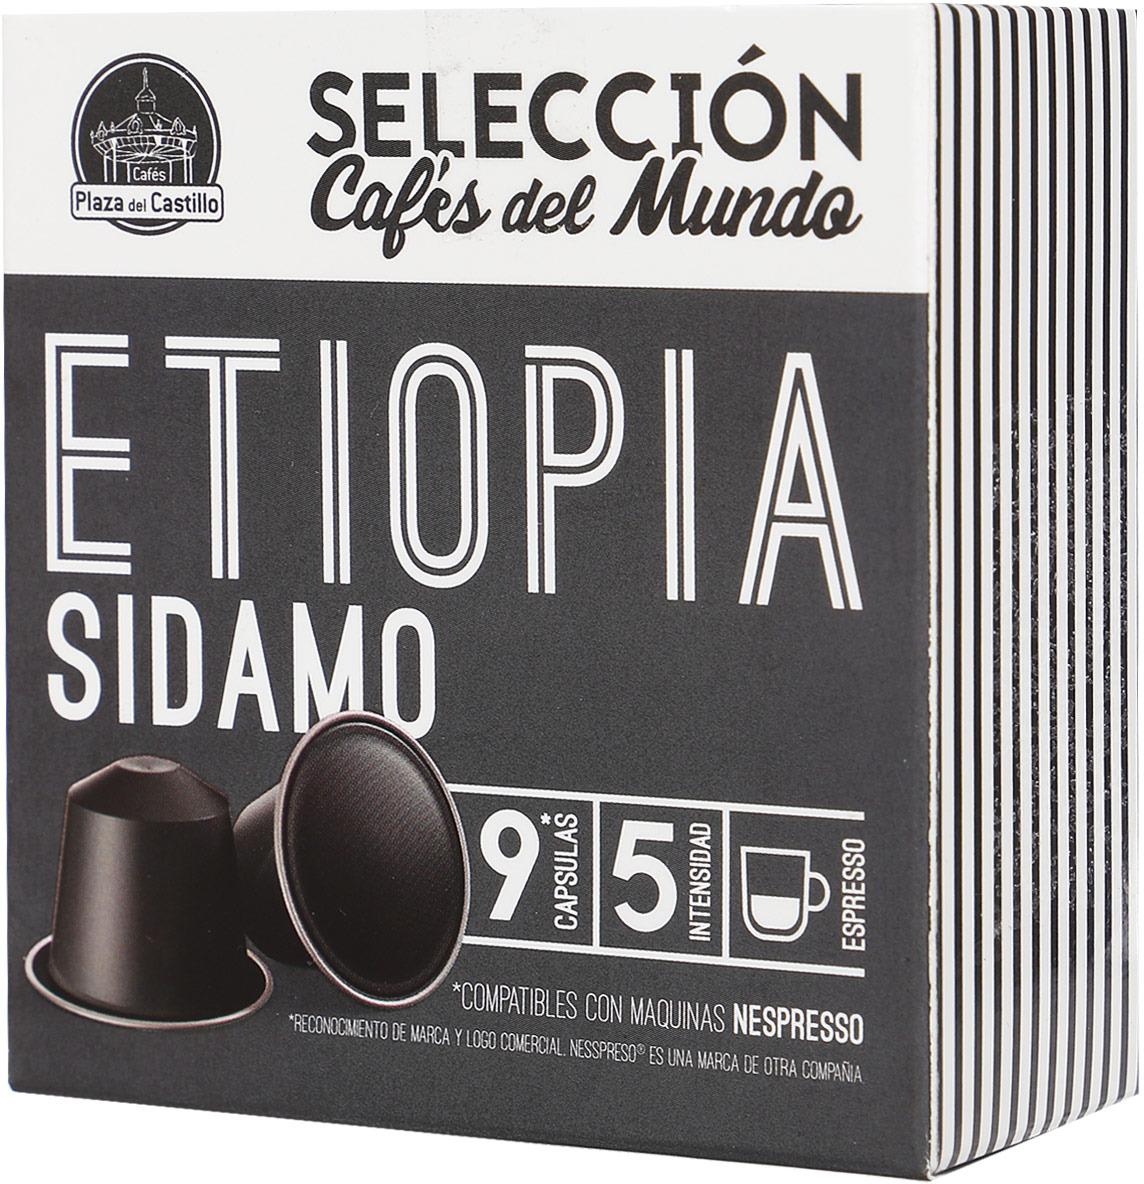 Cafes Plaza del Castillo Отборный кофе стран мира: Эфиопия Кофе в капсулах, 9 шт по 54 г trish morey secrets of castillo del arco